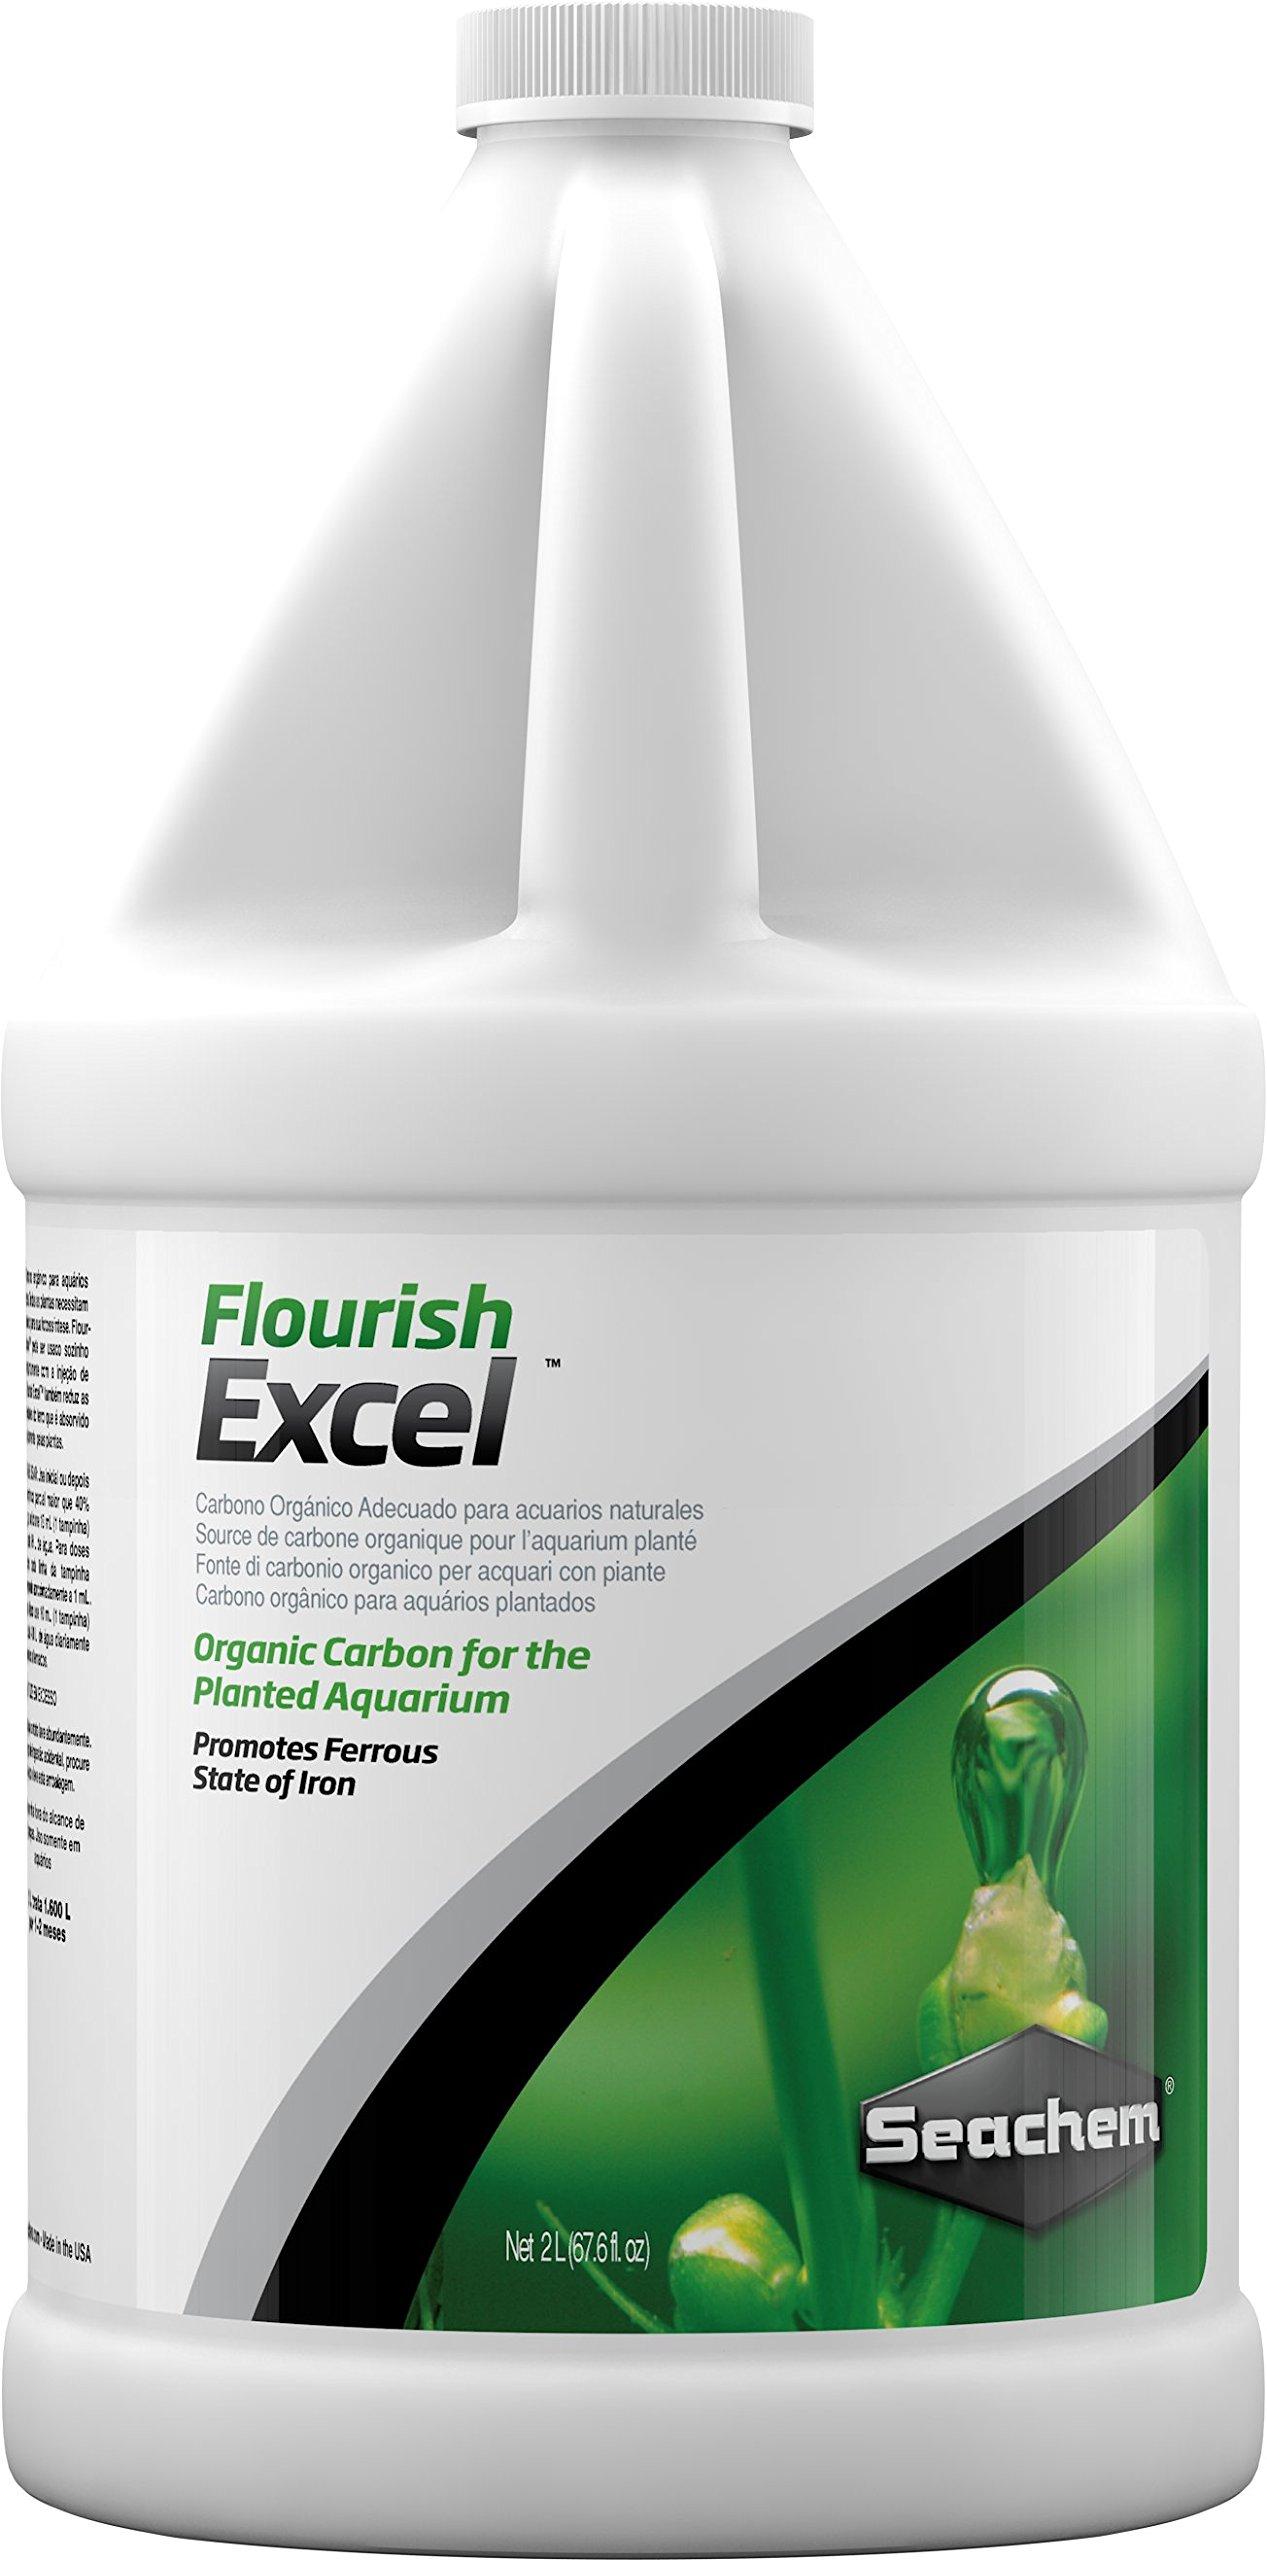 Flourish Excel 2 L / 67.6 fl. oz. for Marine & Saltwater Reef Aquariums!